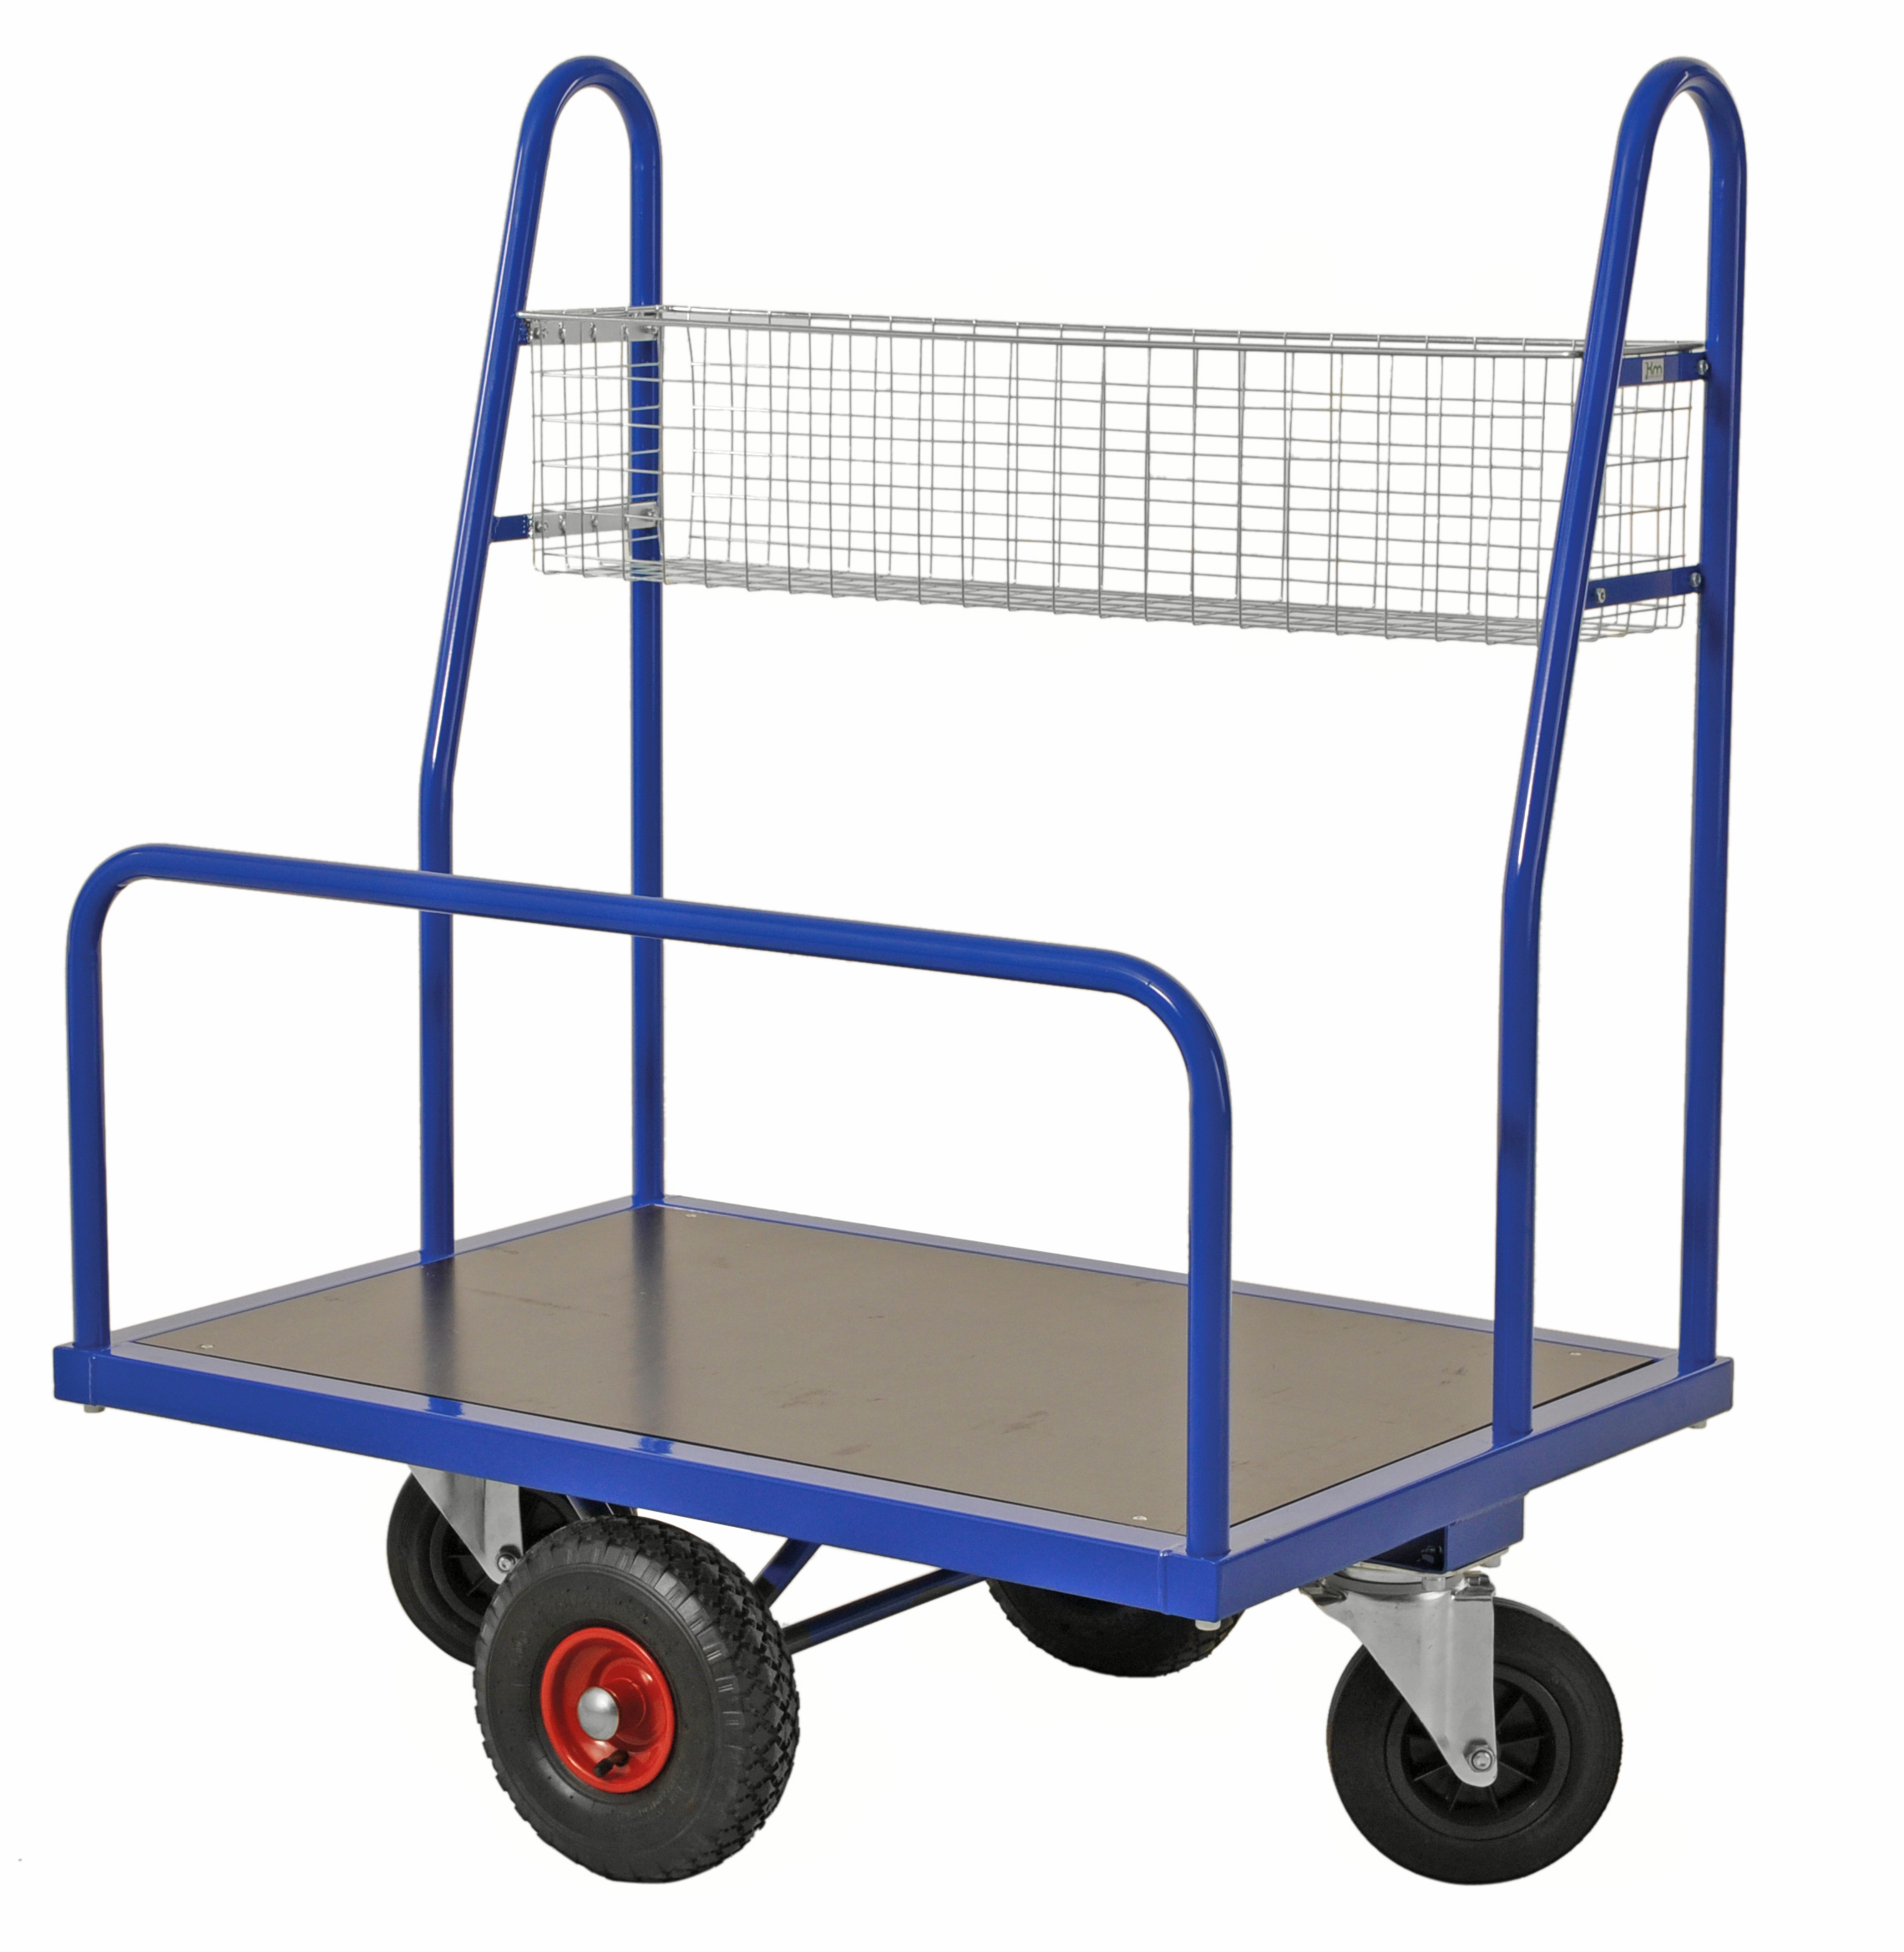 KM08425 | Construction trolley